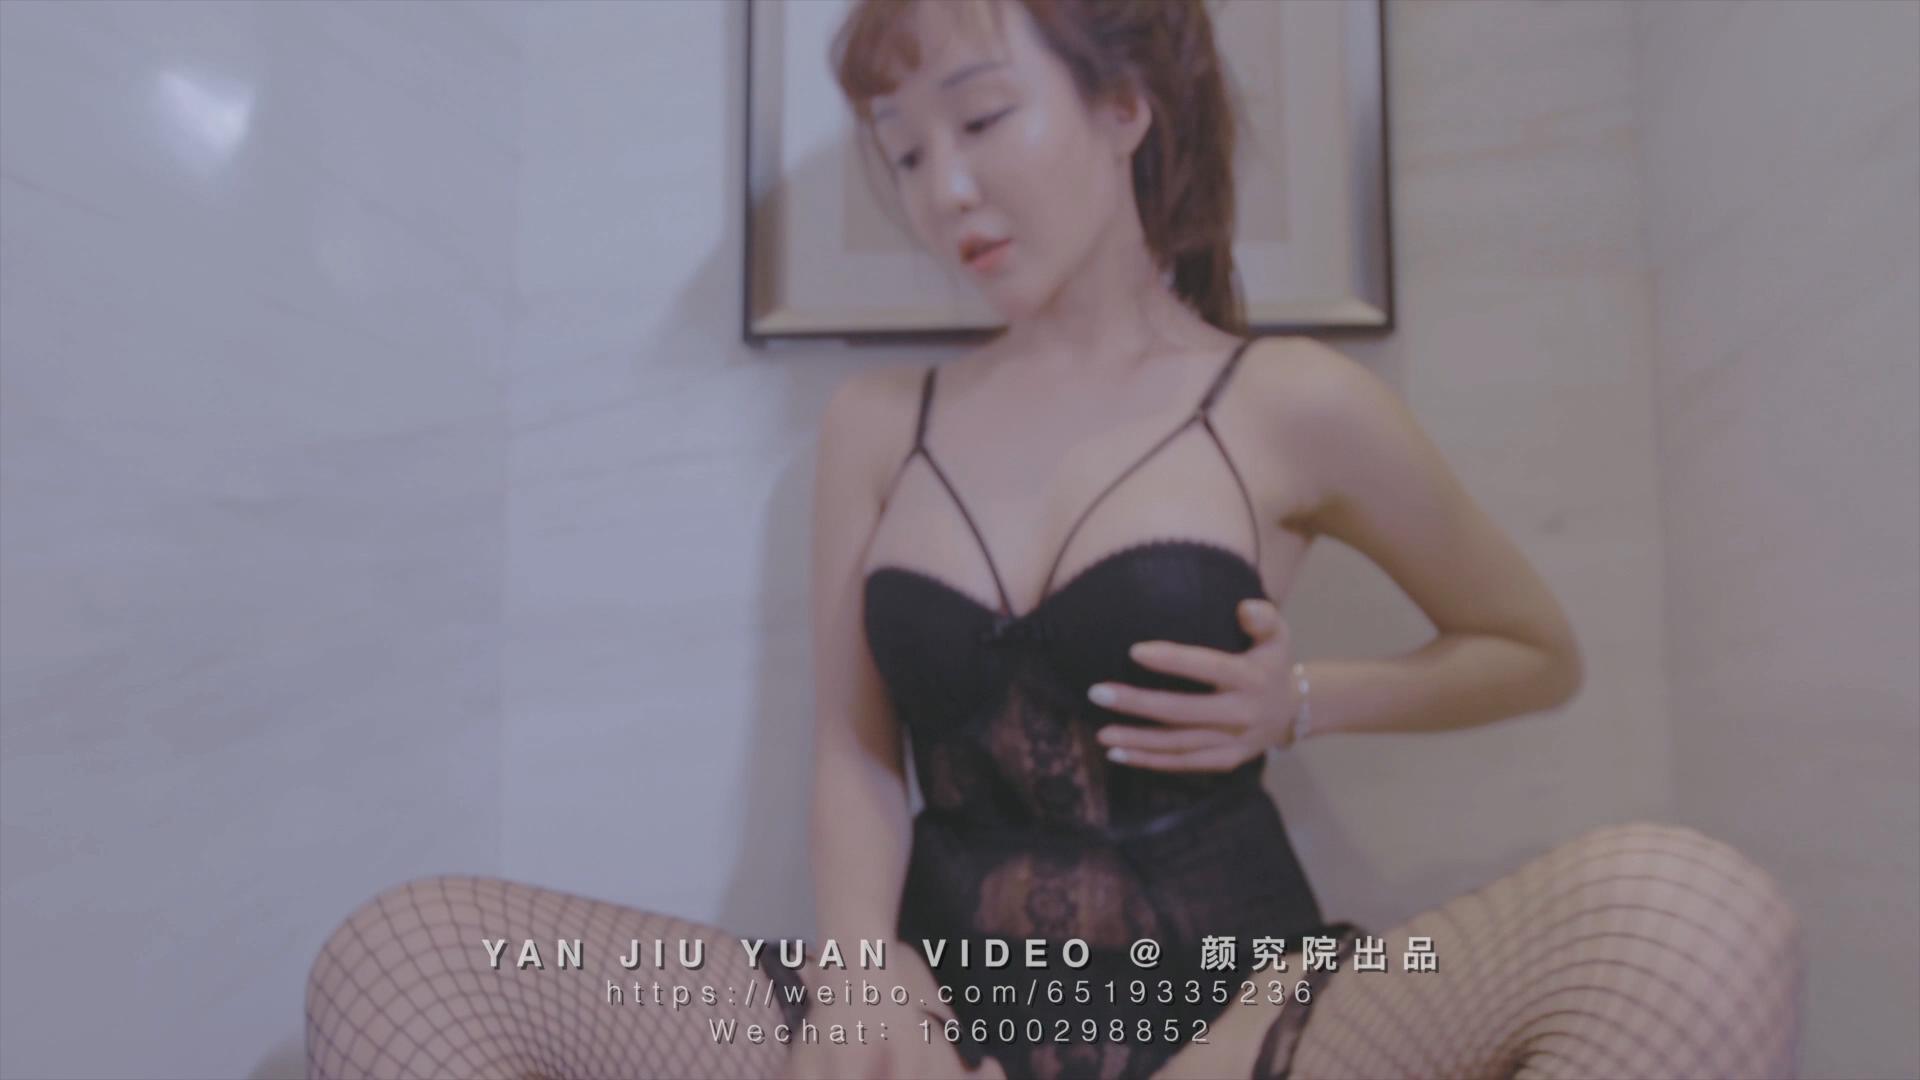 [XiuRen_Video]秀人网视频 2018.06.21 VN.075 顾灿 [1V/933.40MB]